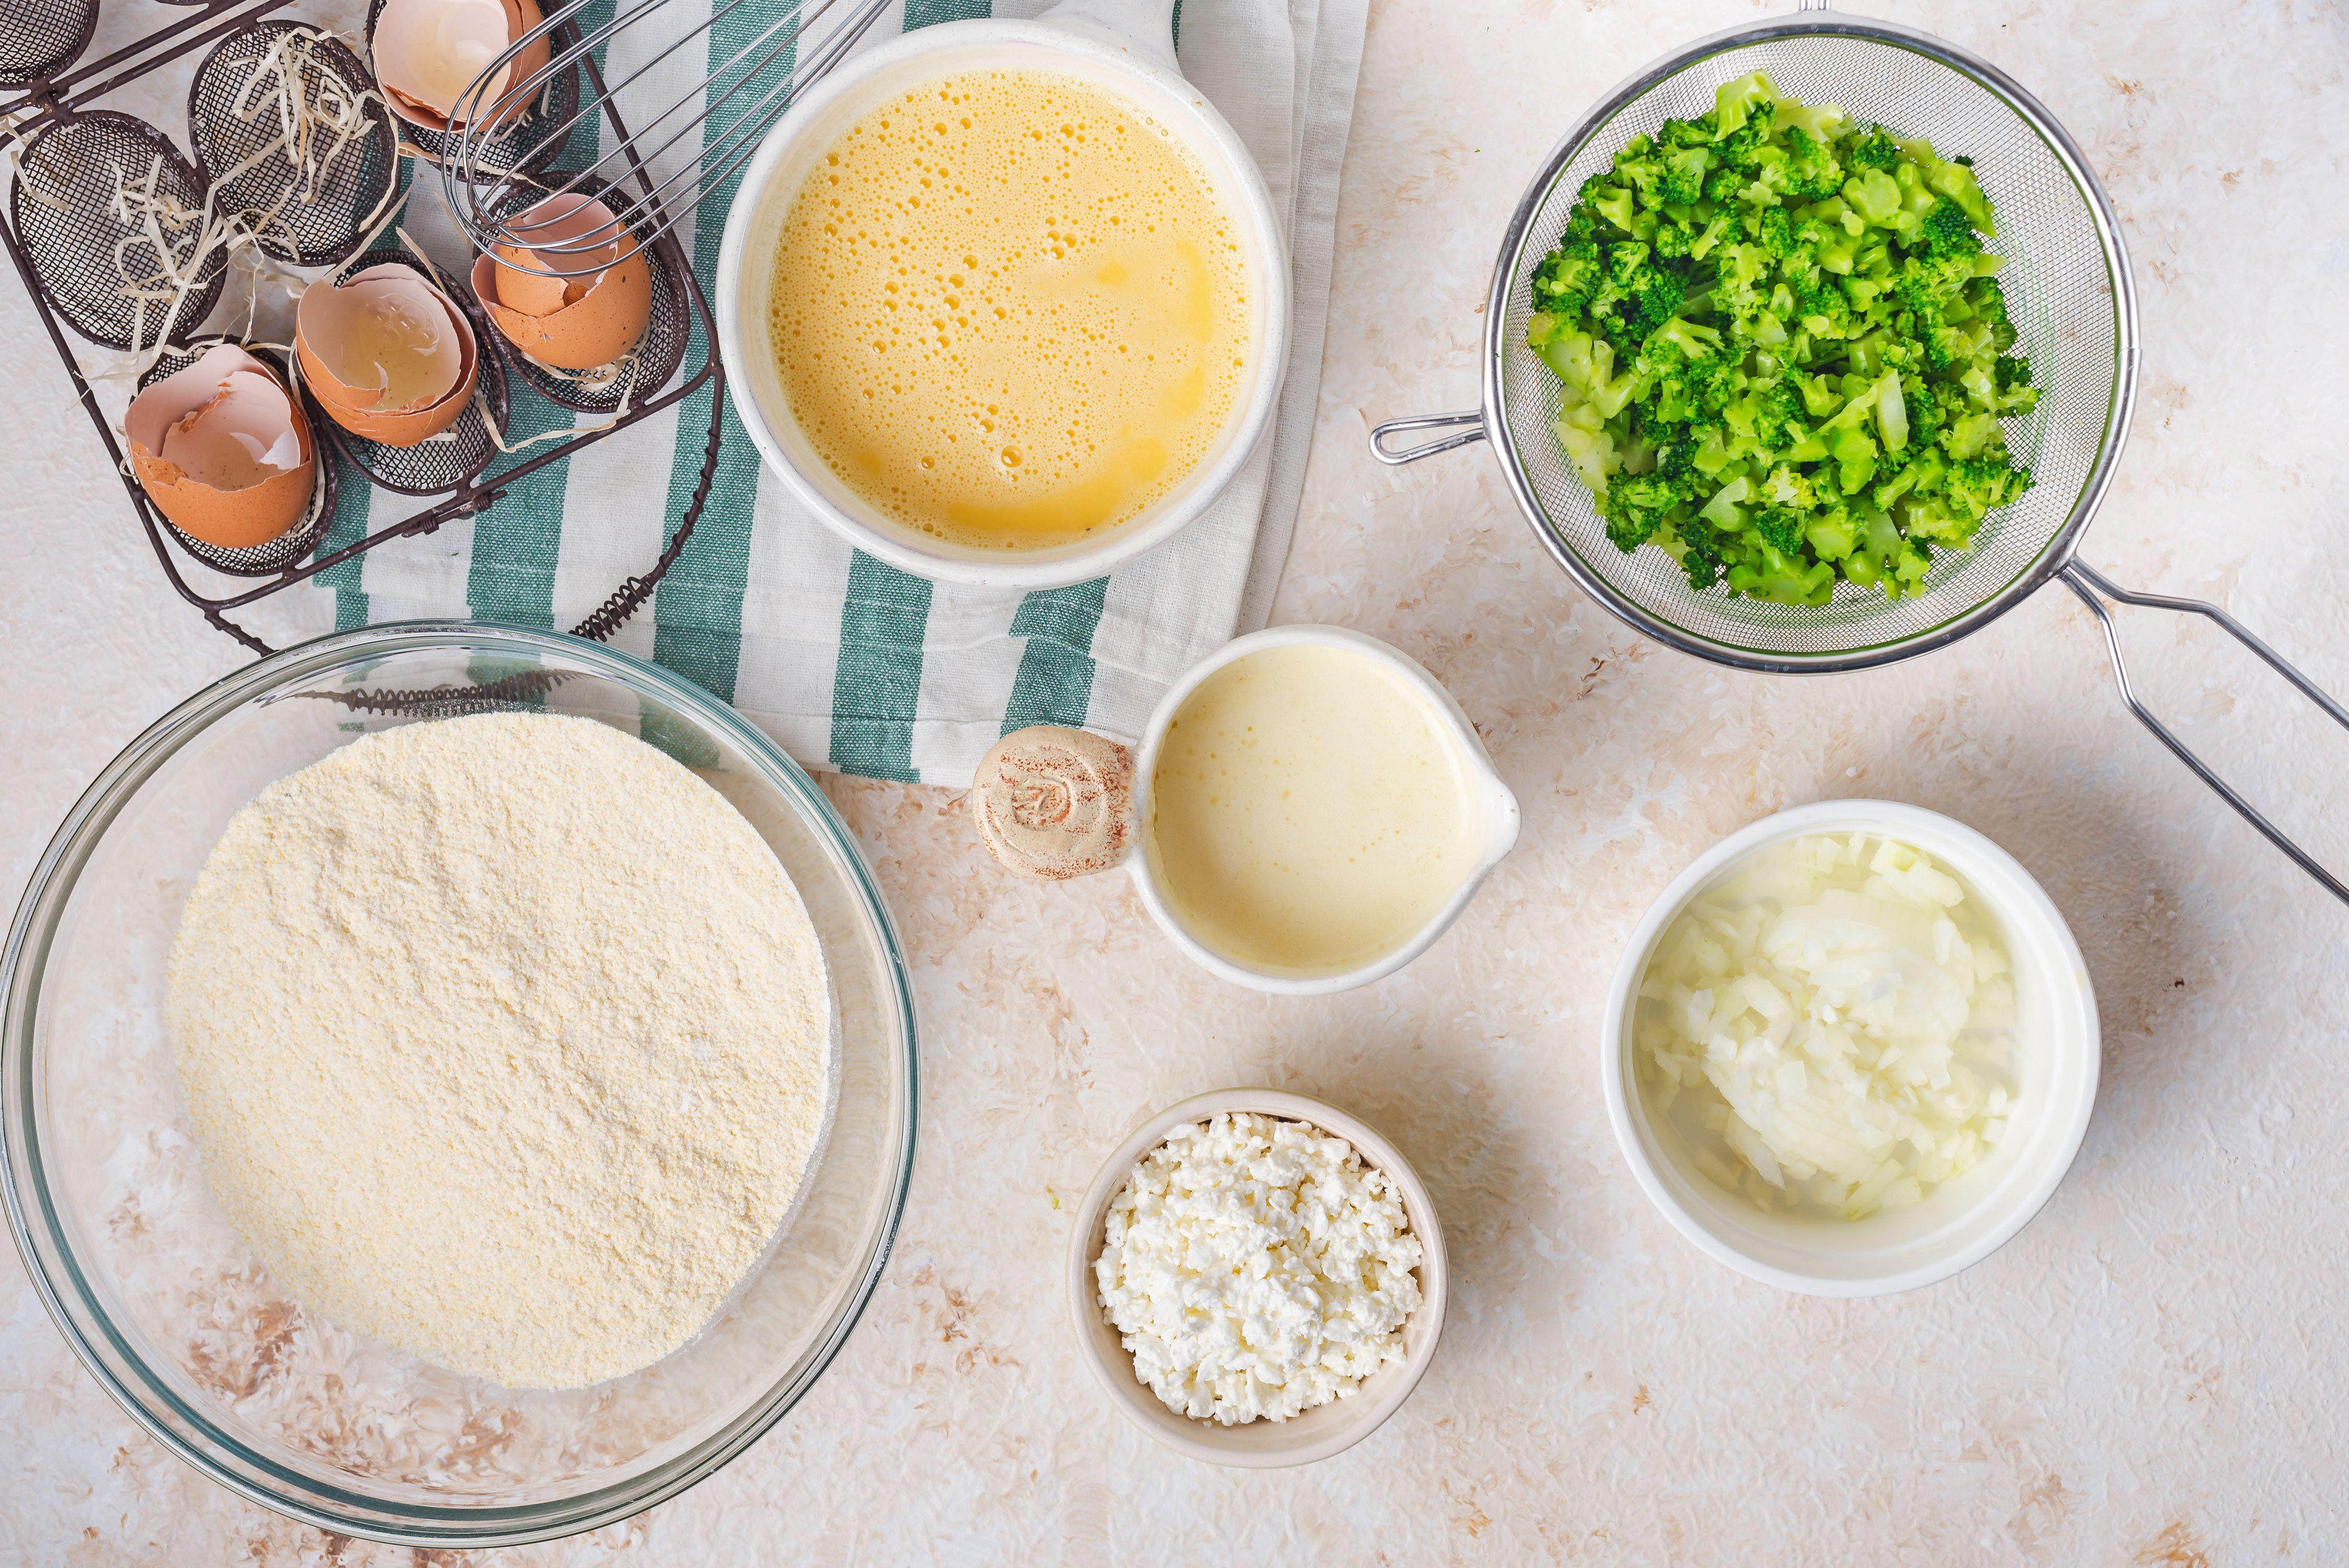 Ingredients for broccoli cornbread